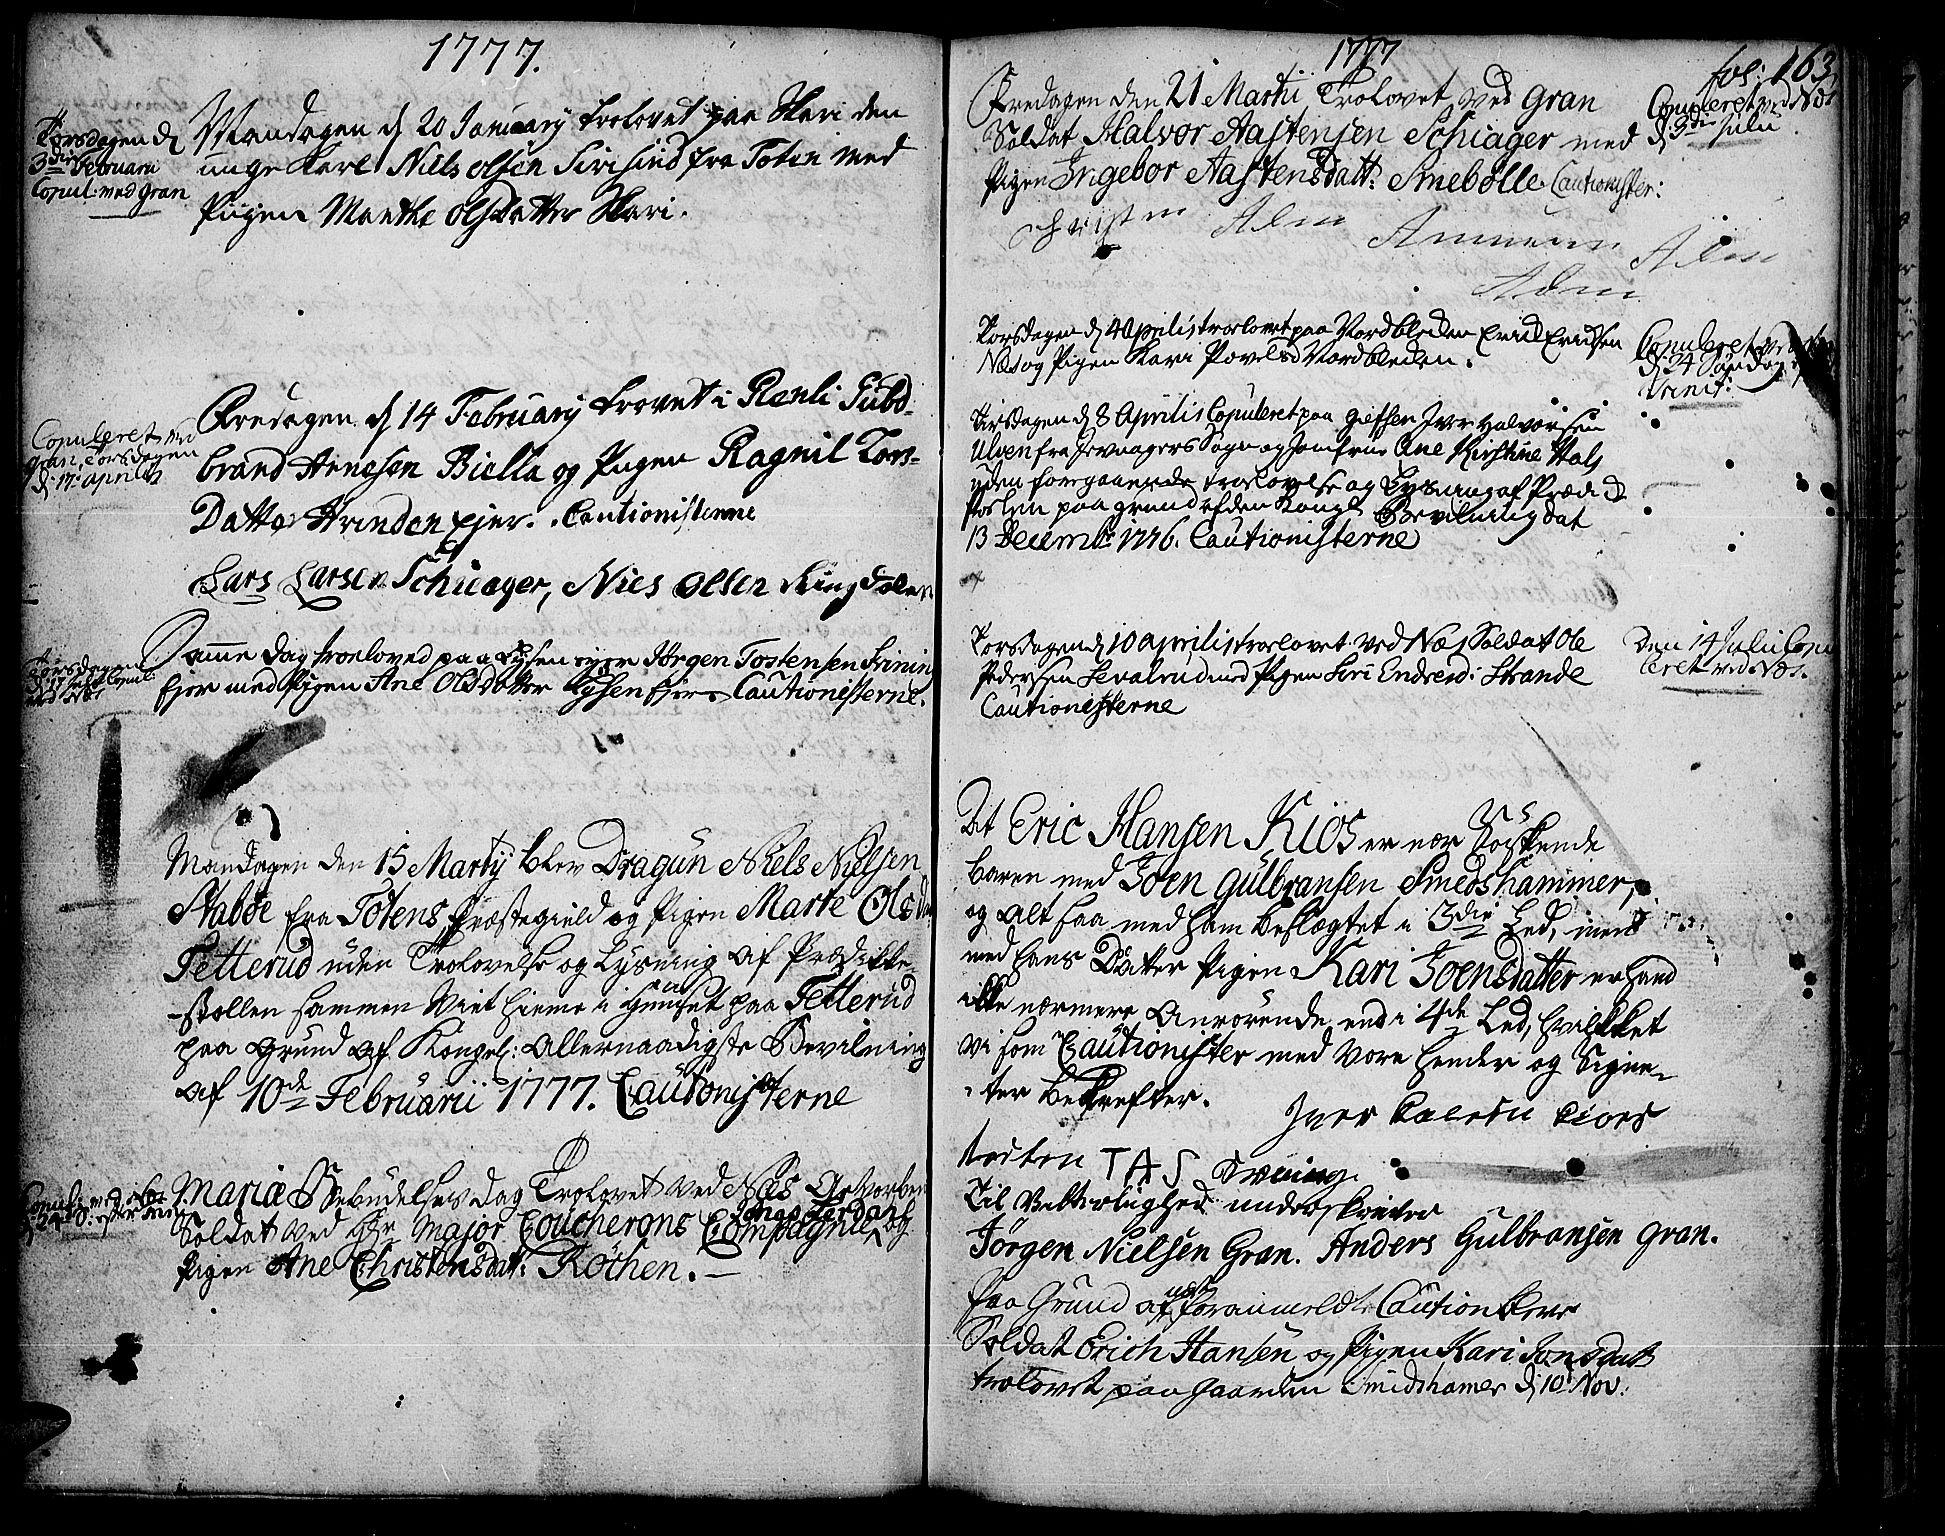 SAH, Gran prestekontor, Ministerialbok nr. 5, 1776-1788, s. 163